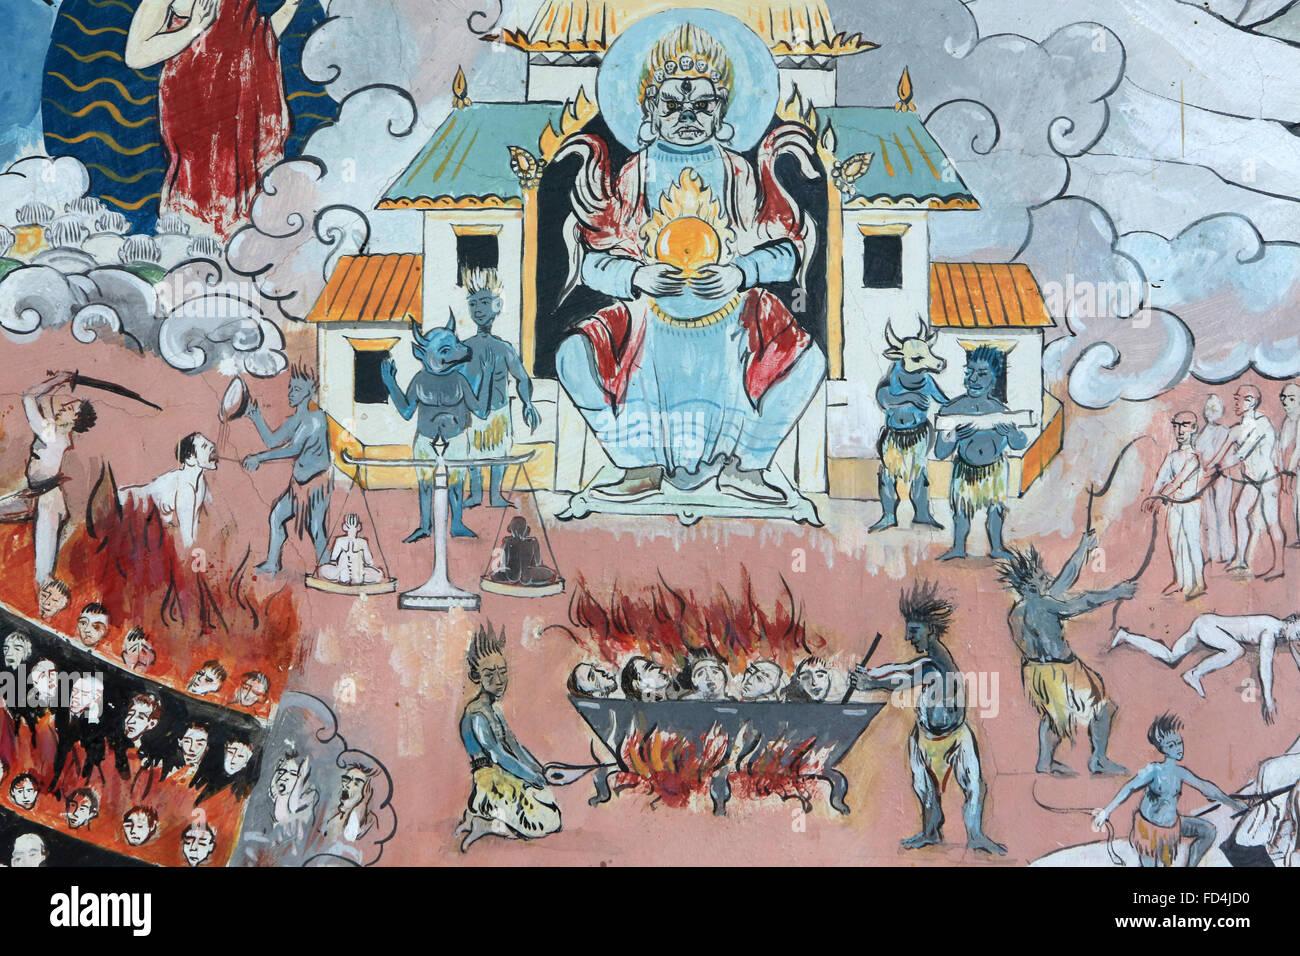 Mandala des Universums. Der heißen Hölle. Dashang Kagyu Ling Kongregation. Tempel der tausend Buddhas. Stockbild